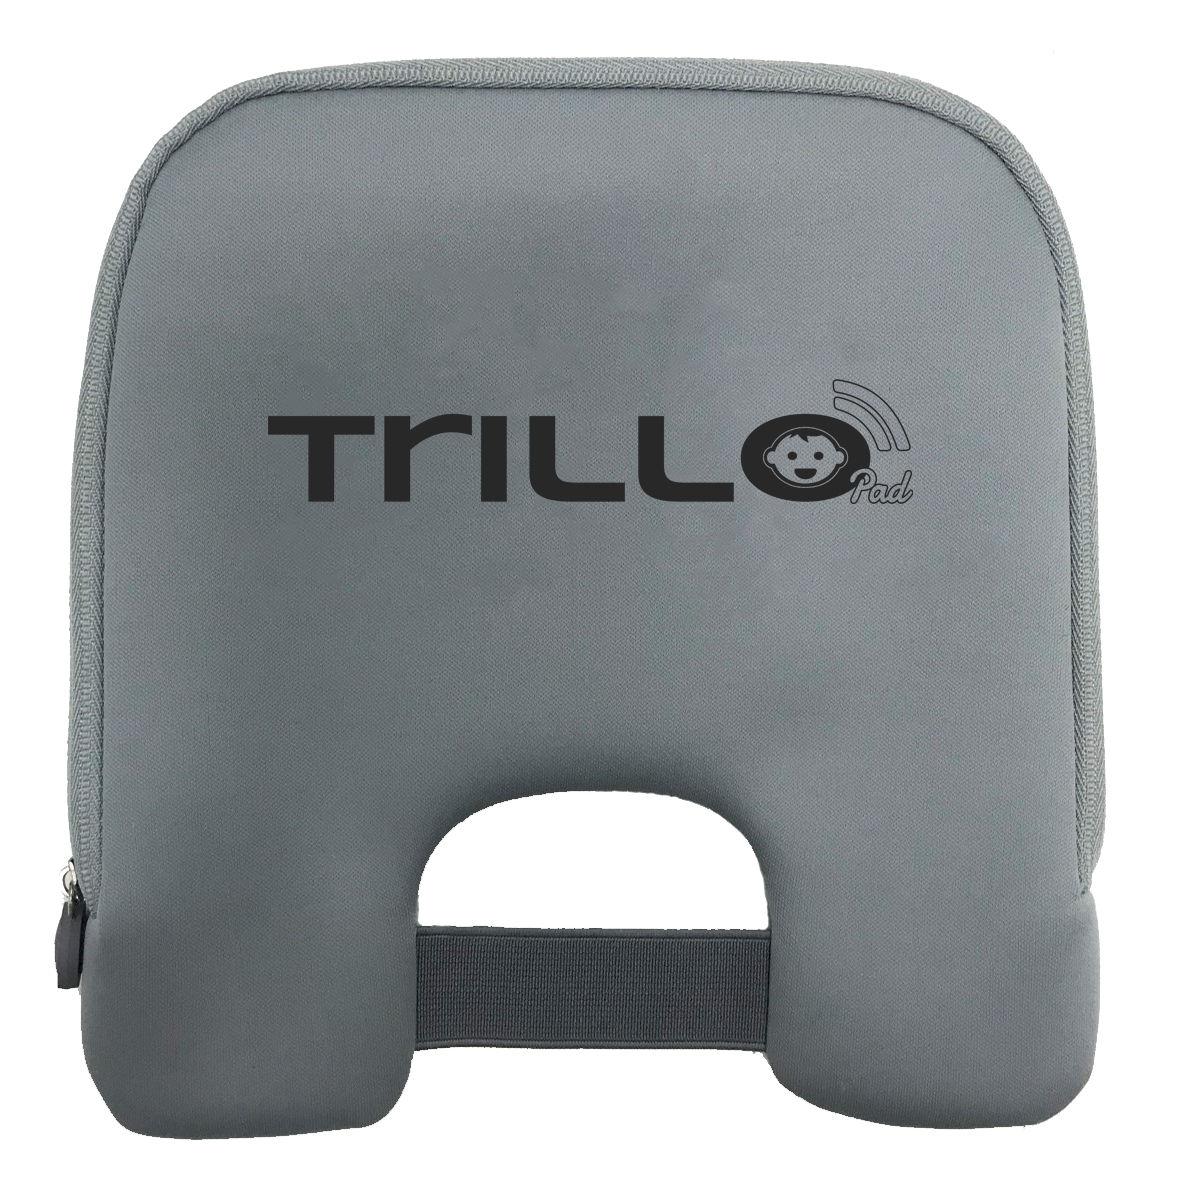 MPA Tech TrilloPad